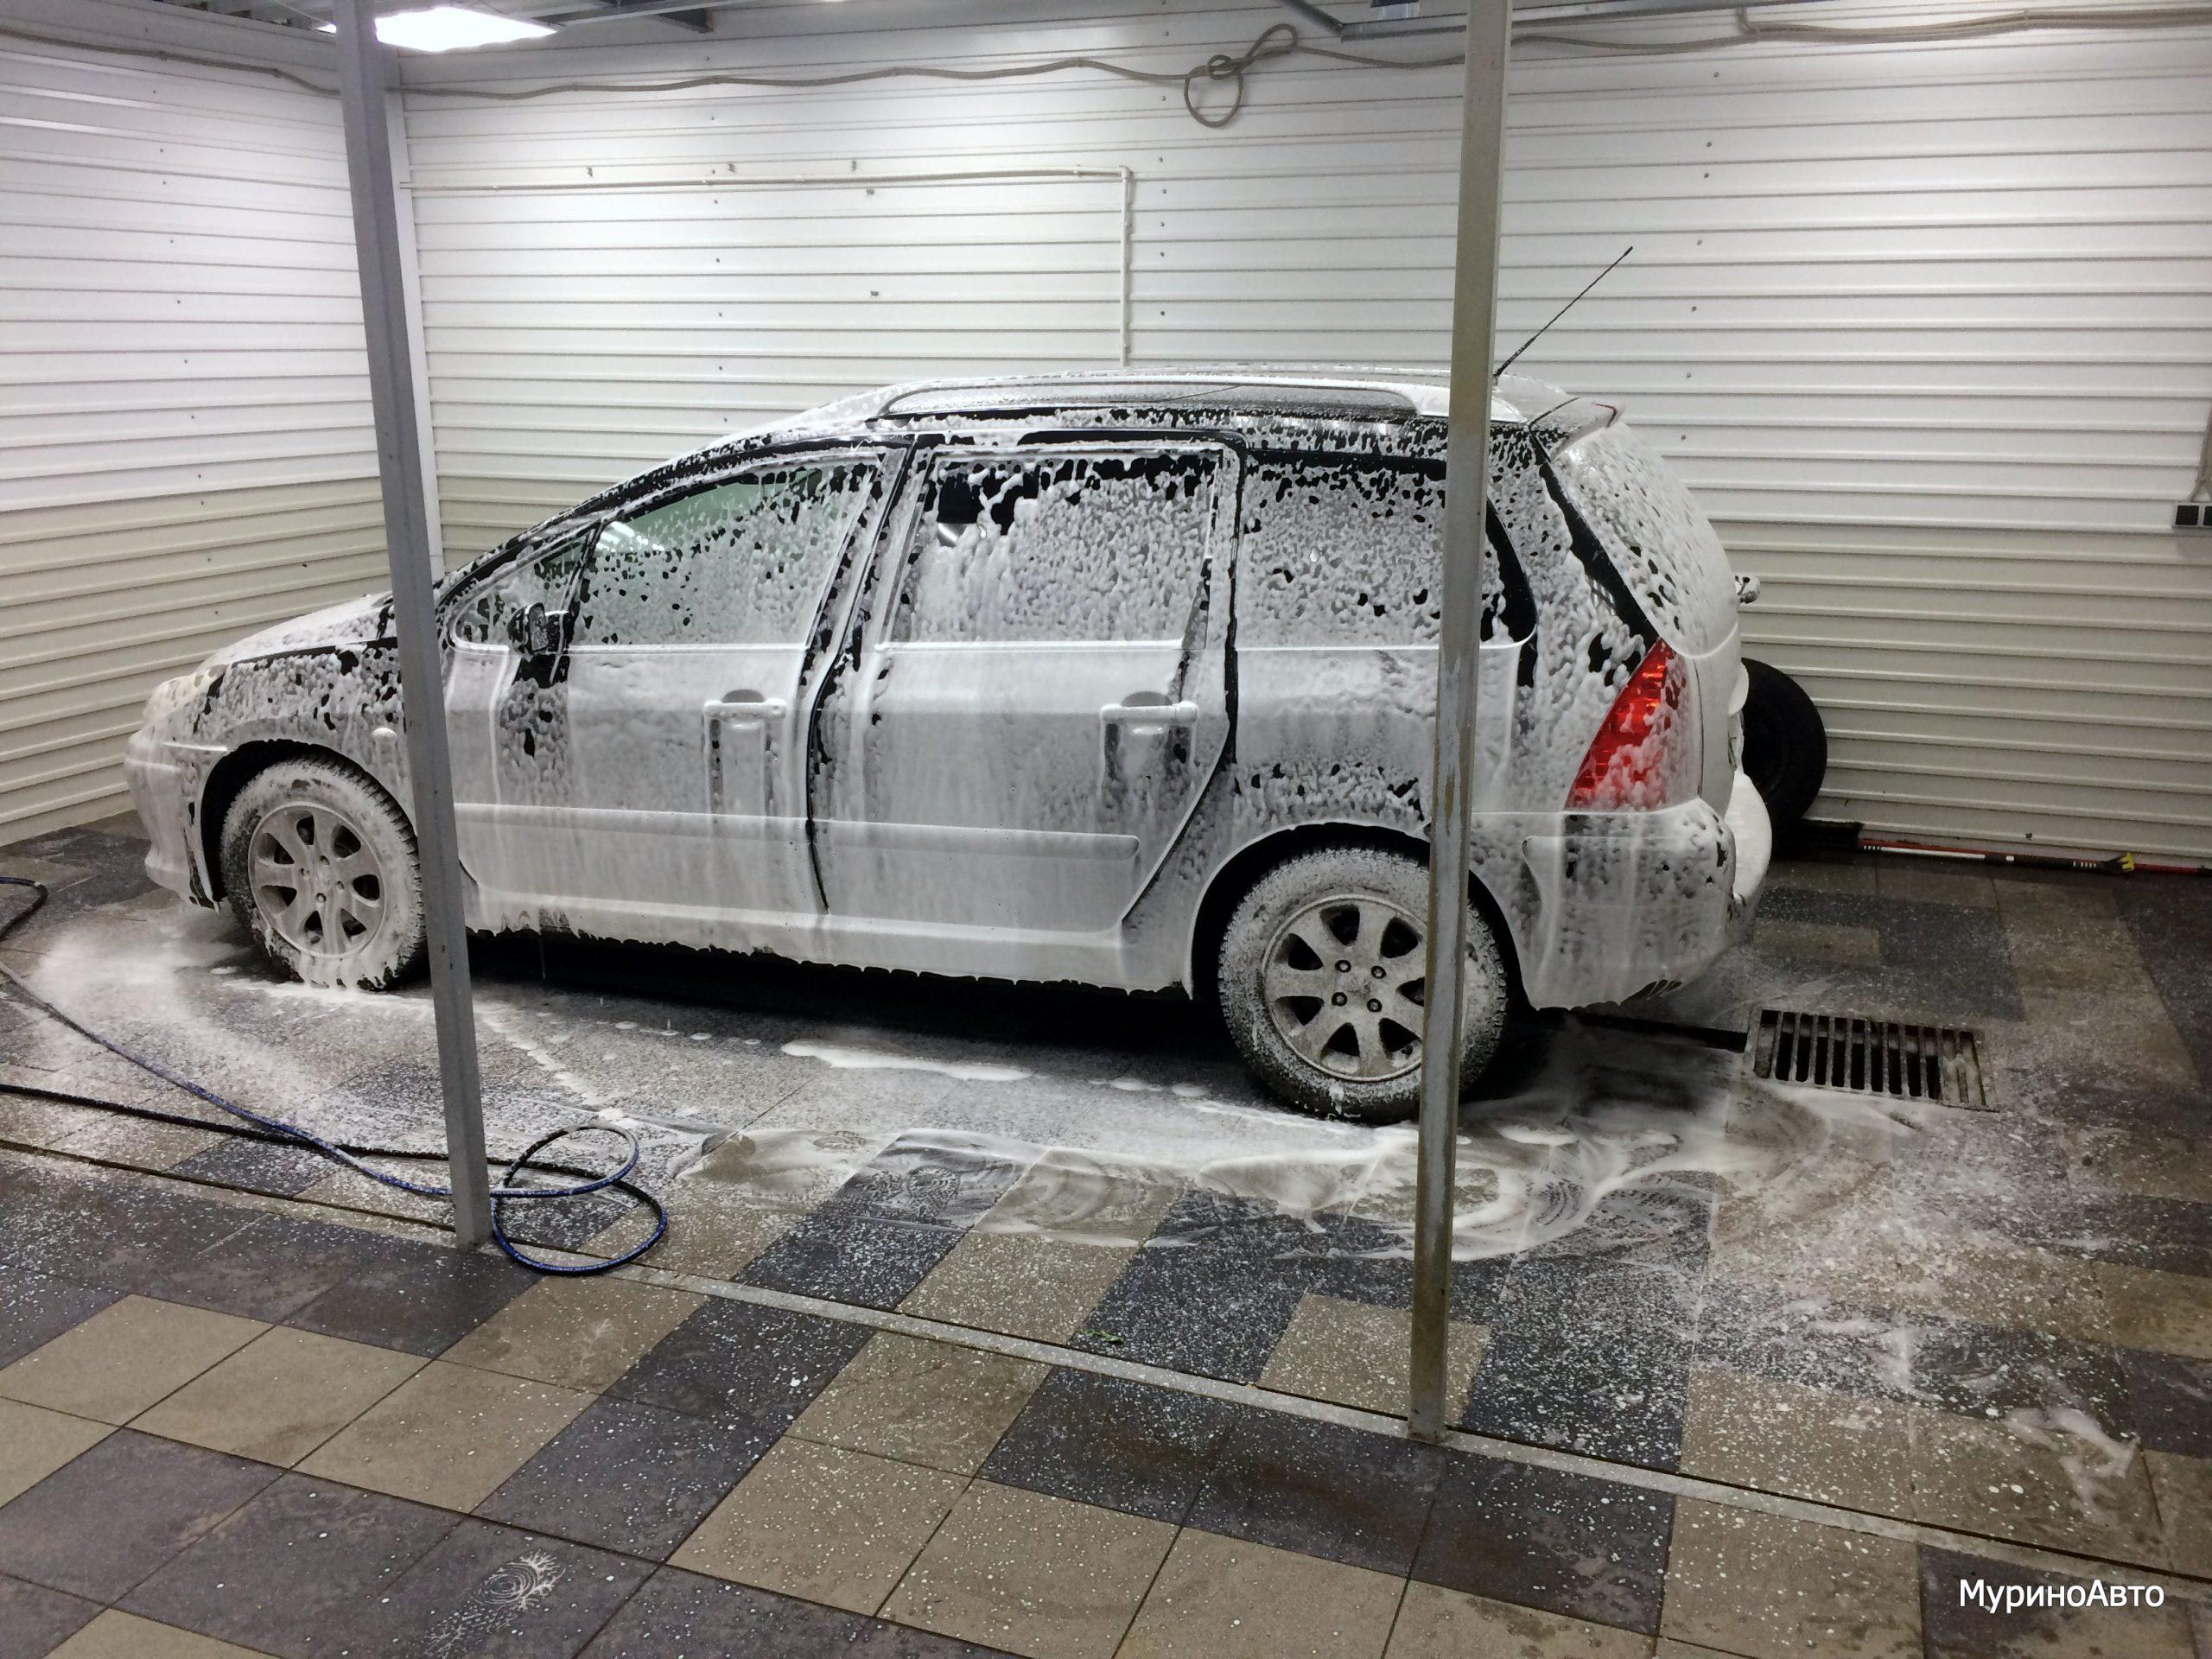 Автомойка МуриноАвто